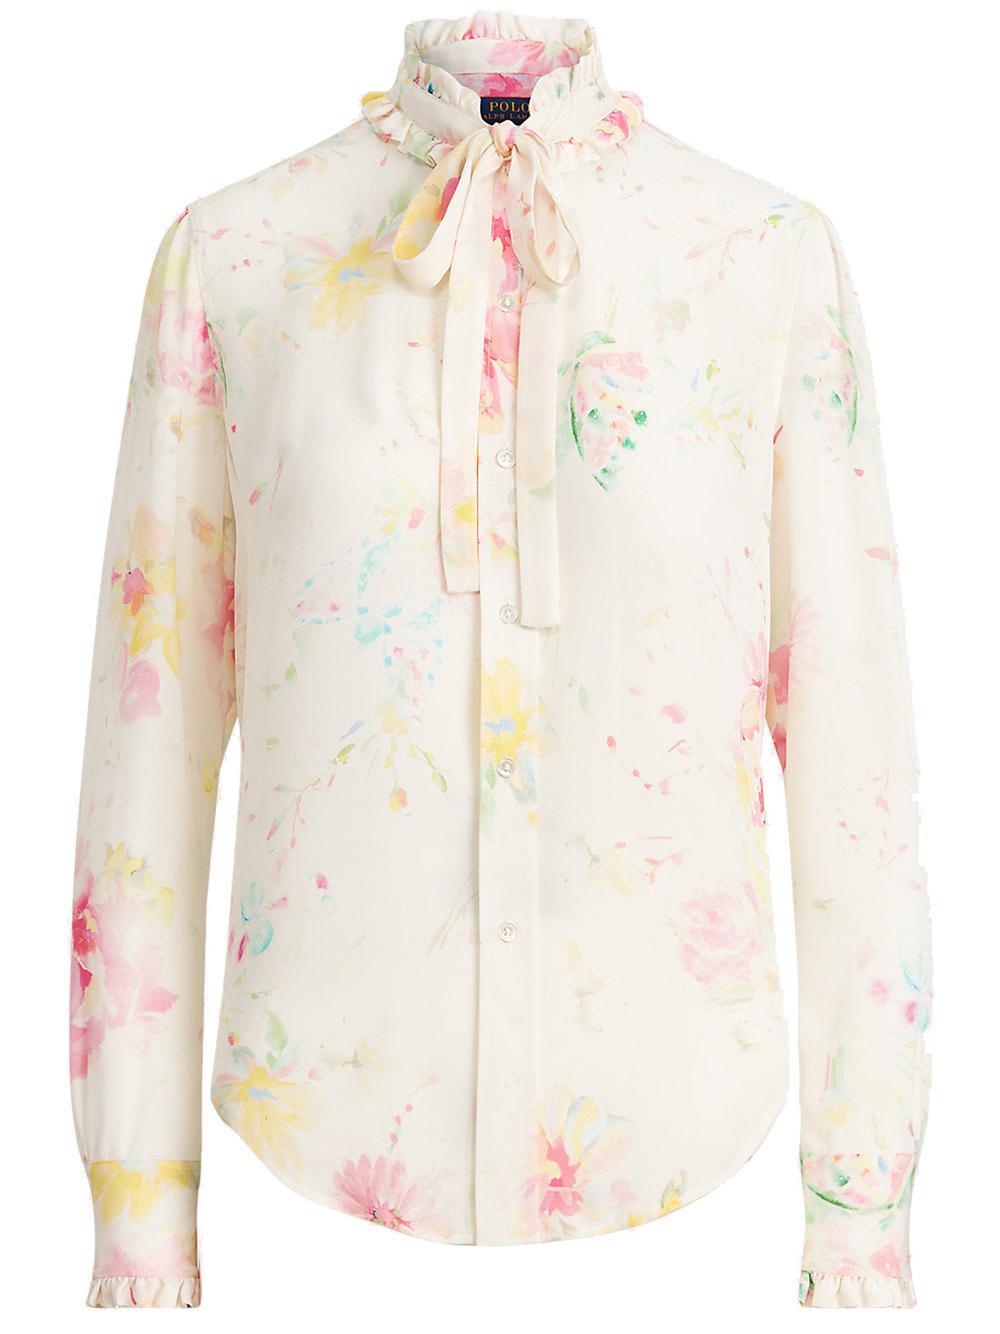 Ruffle Trim Floral Blouse Item # 211835375003